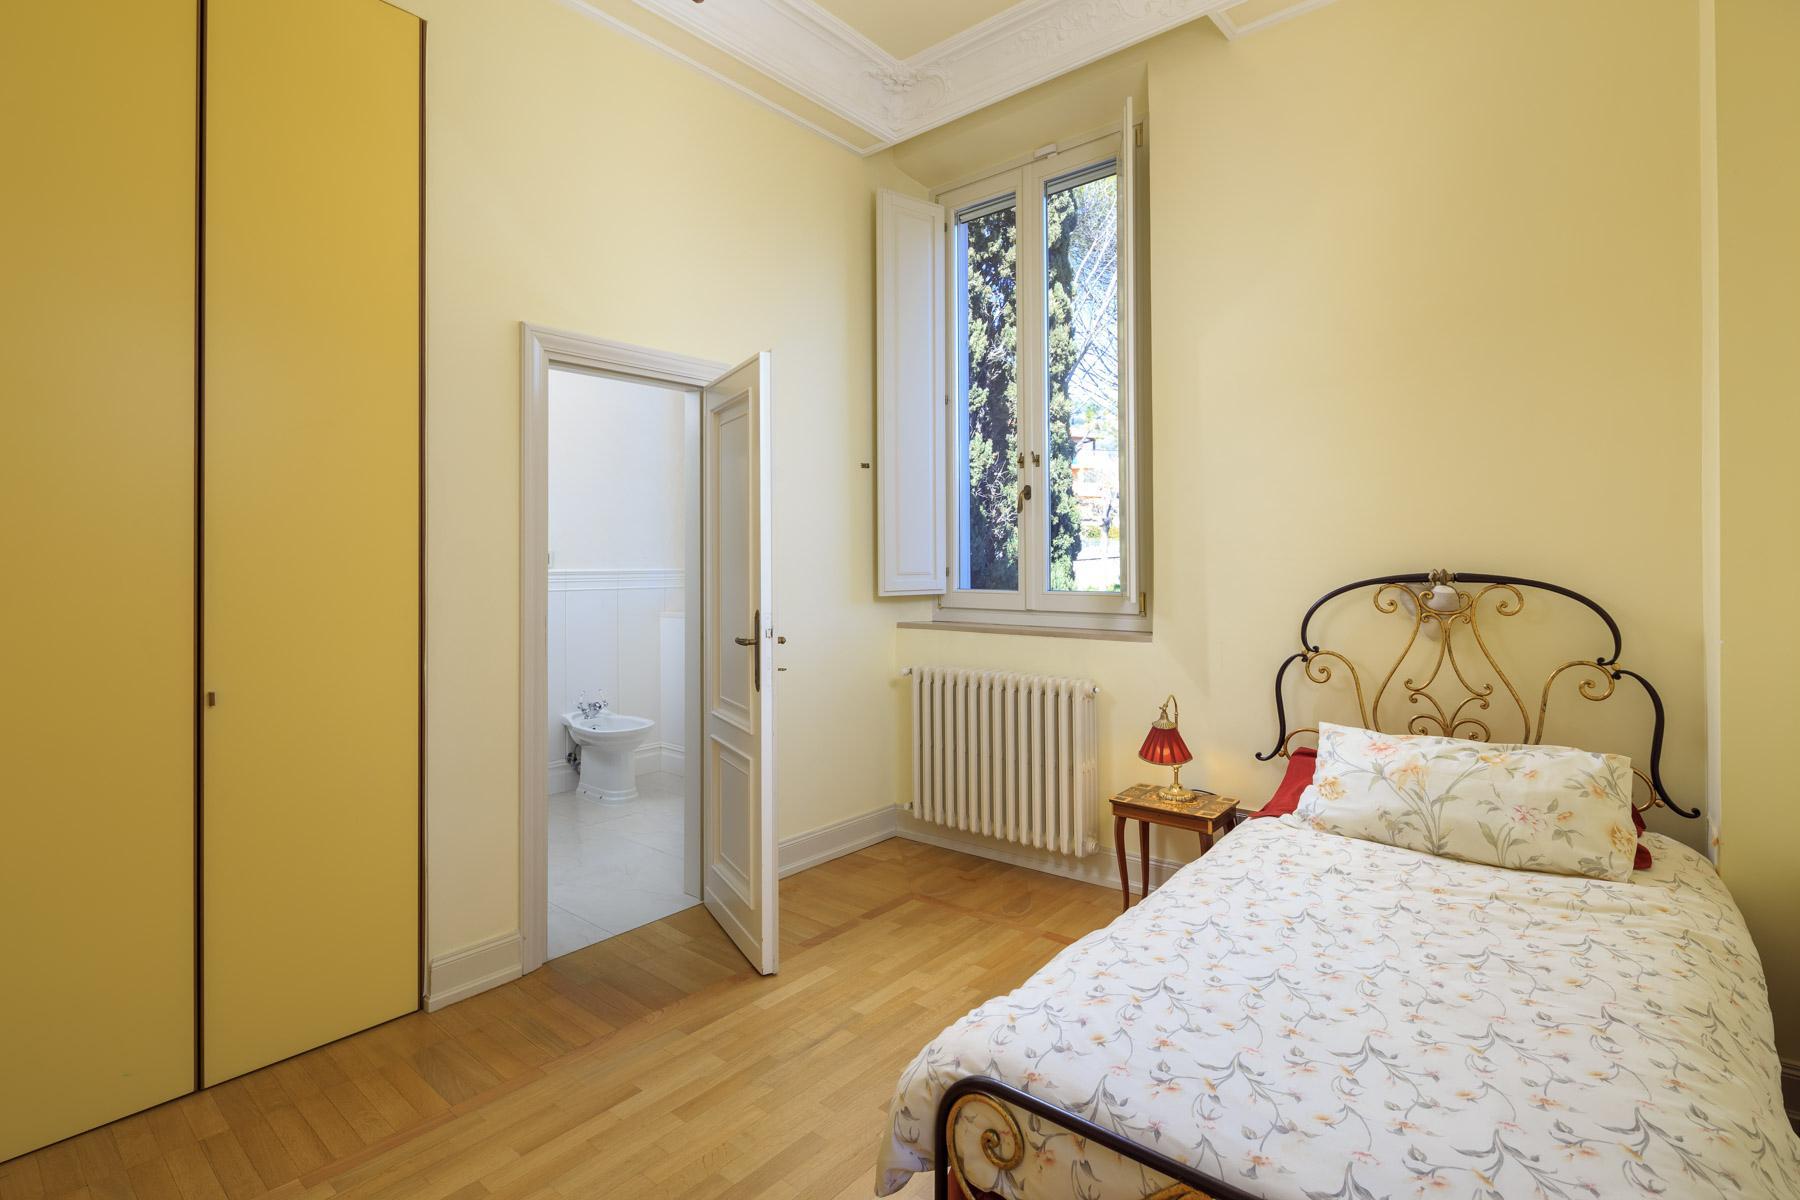 Montecatini Terme小镇优雅的新艺术风格的别墅 - 23